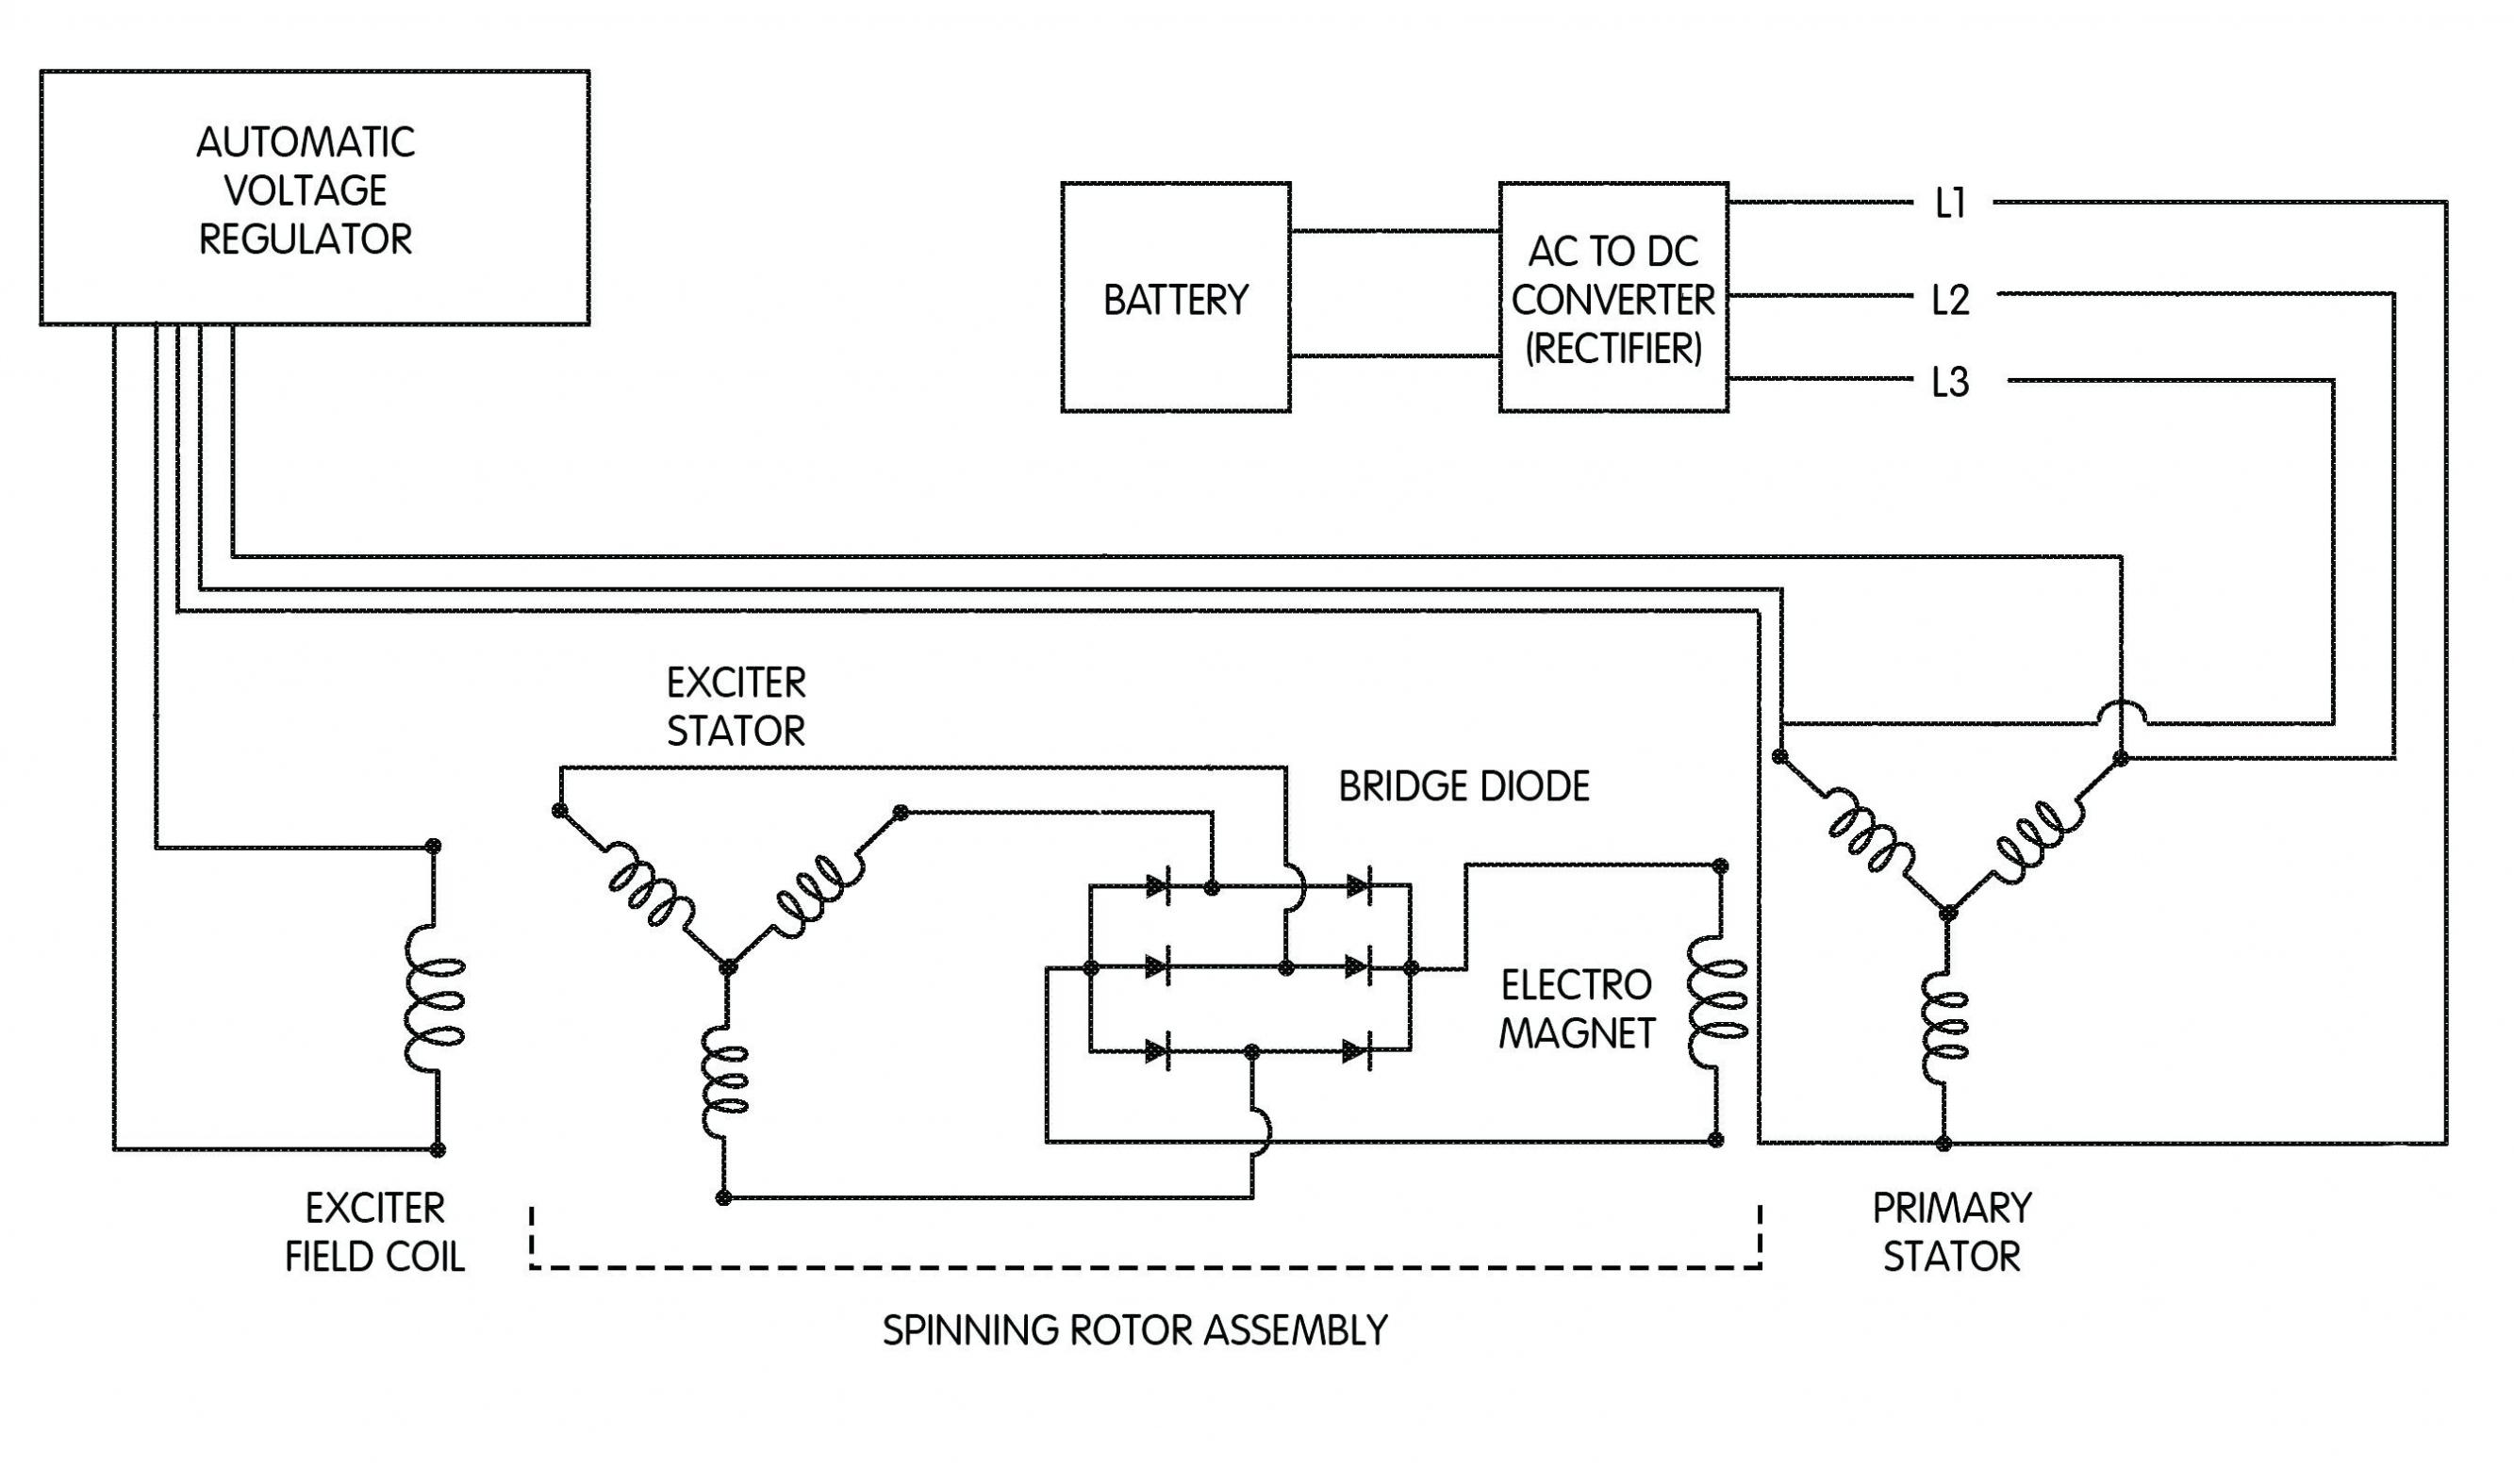 Ford 8N Tractor 12V Alternator Wiring | Best Wiring Library - Ford 8N Wiring Diagram